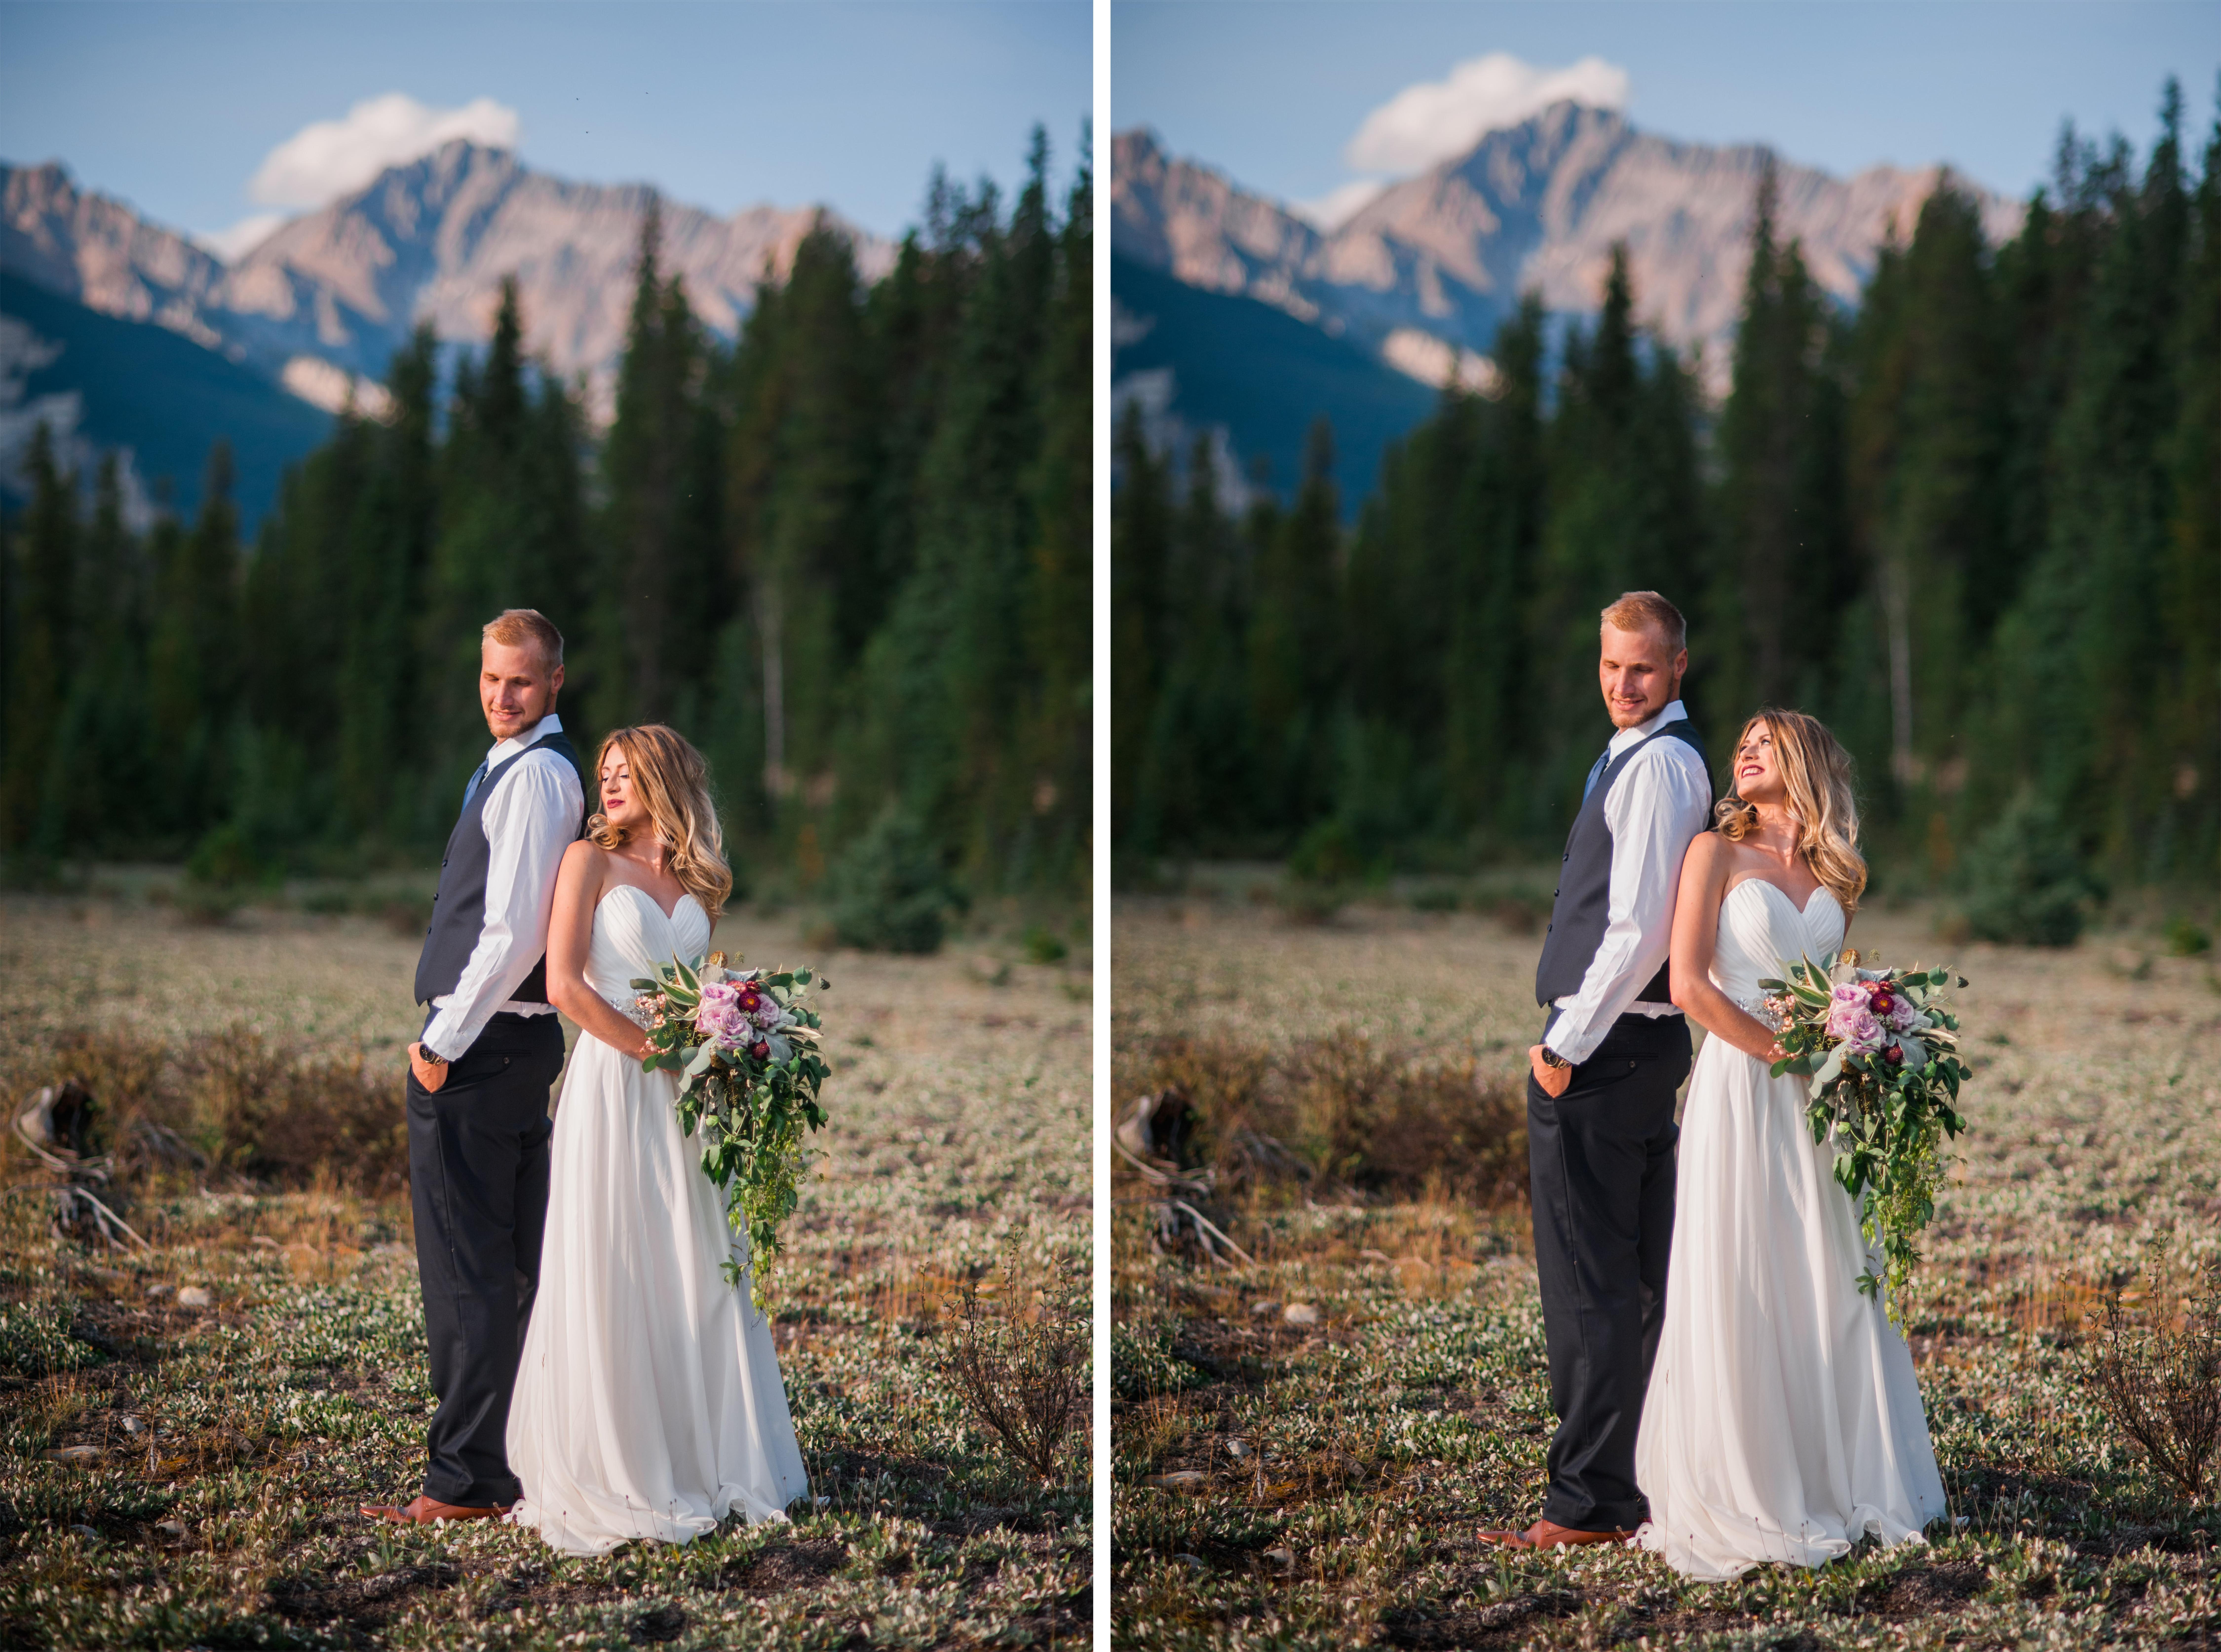 22-wedding-workshop-retreat-in-golden-bc-rhiannon-sarah-photography